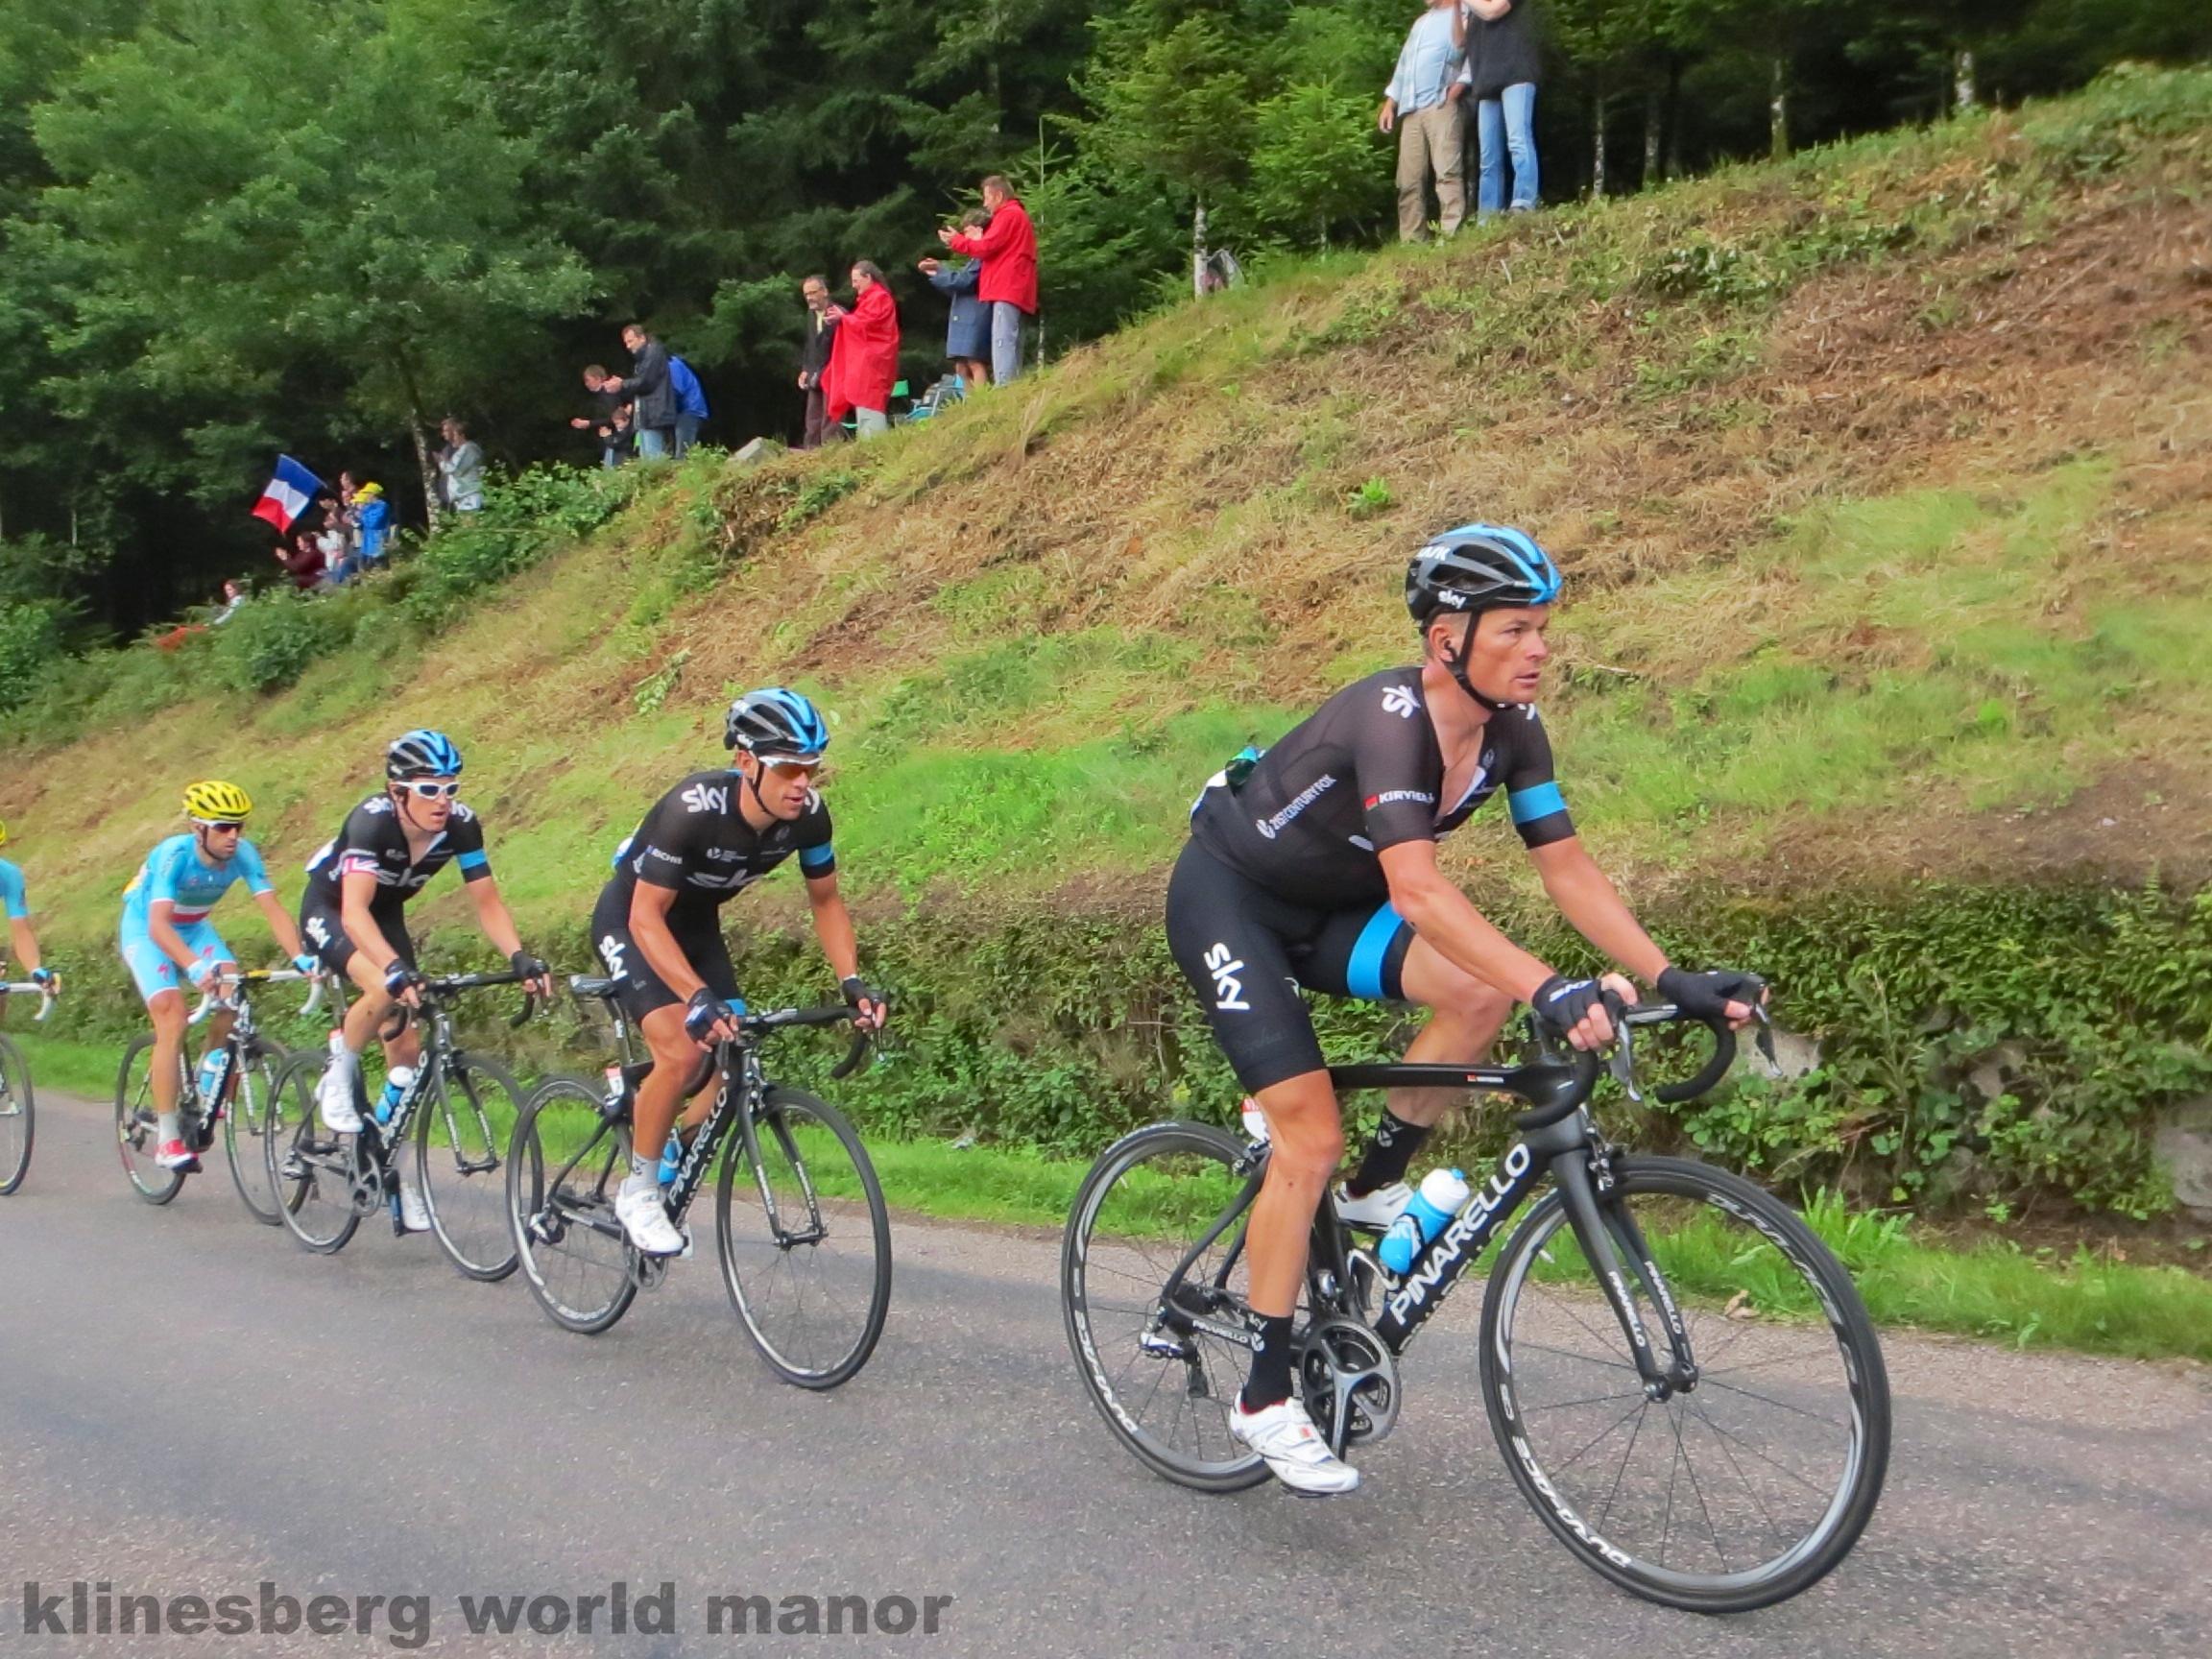 Orica greenedge klinesberg world manor for Richie porte team sky